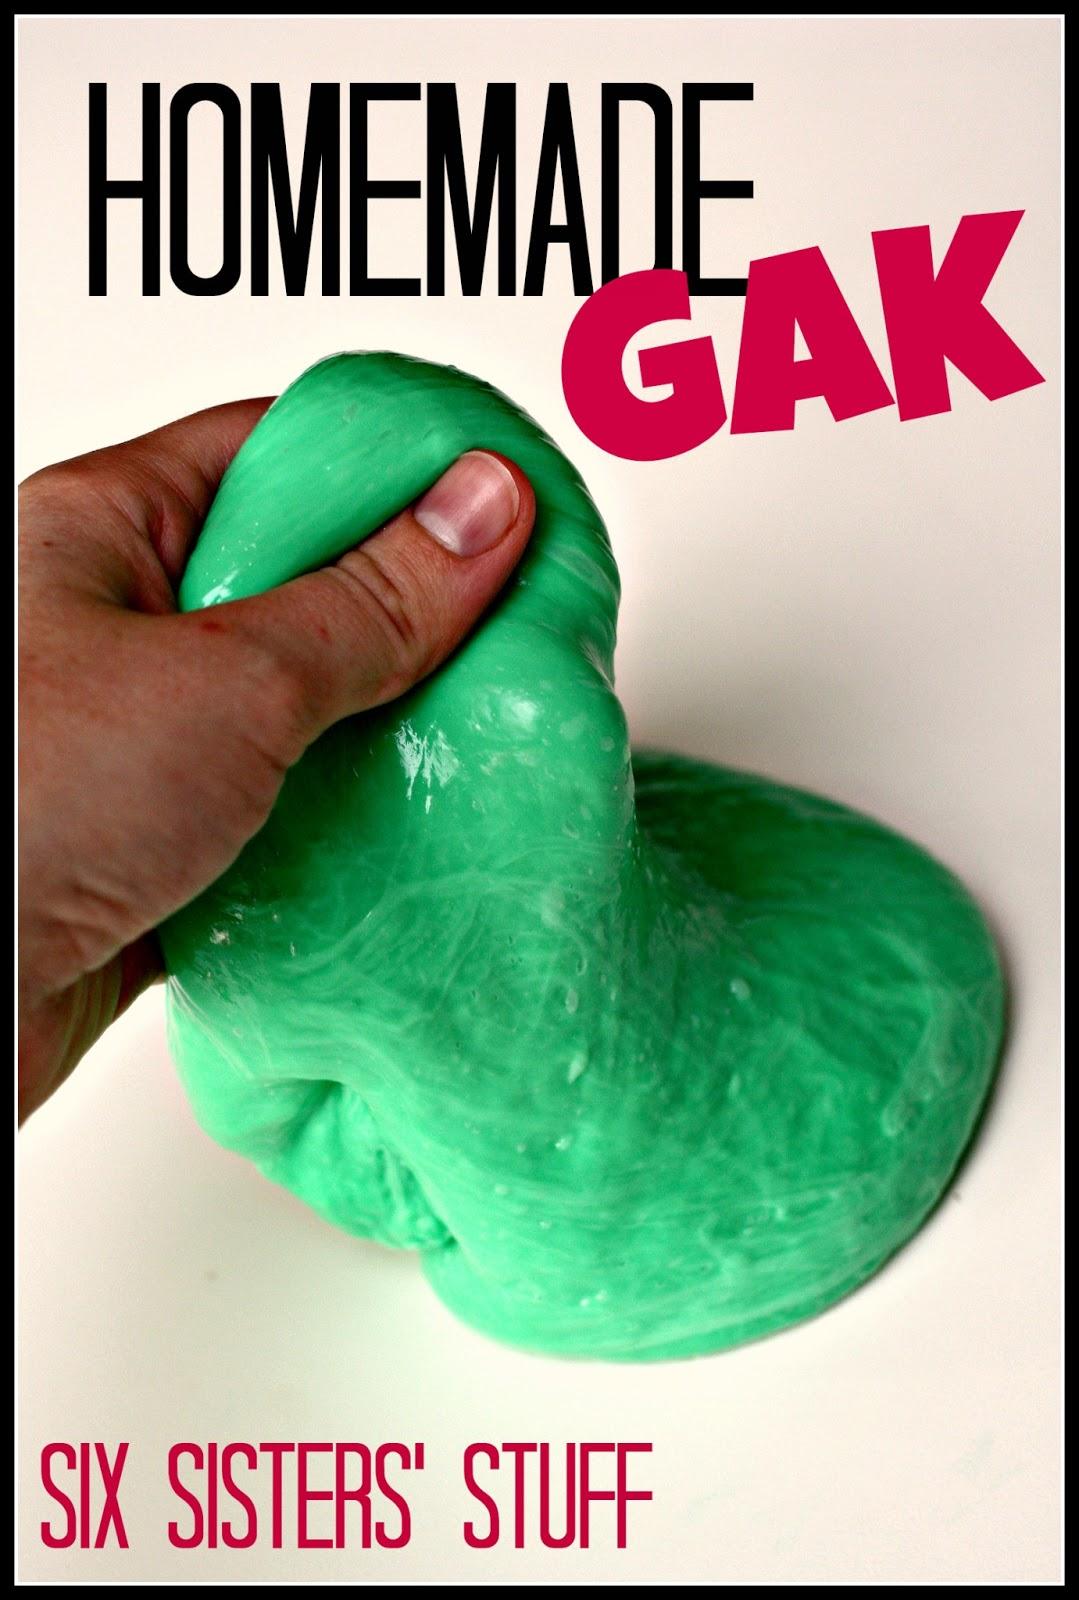 how to make homemade gak